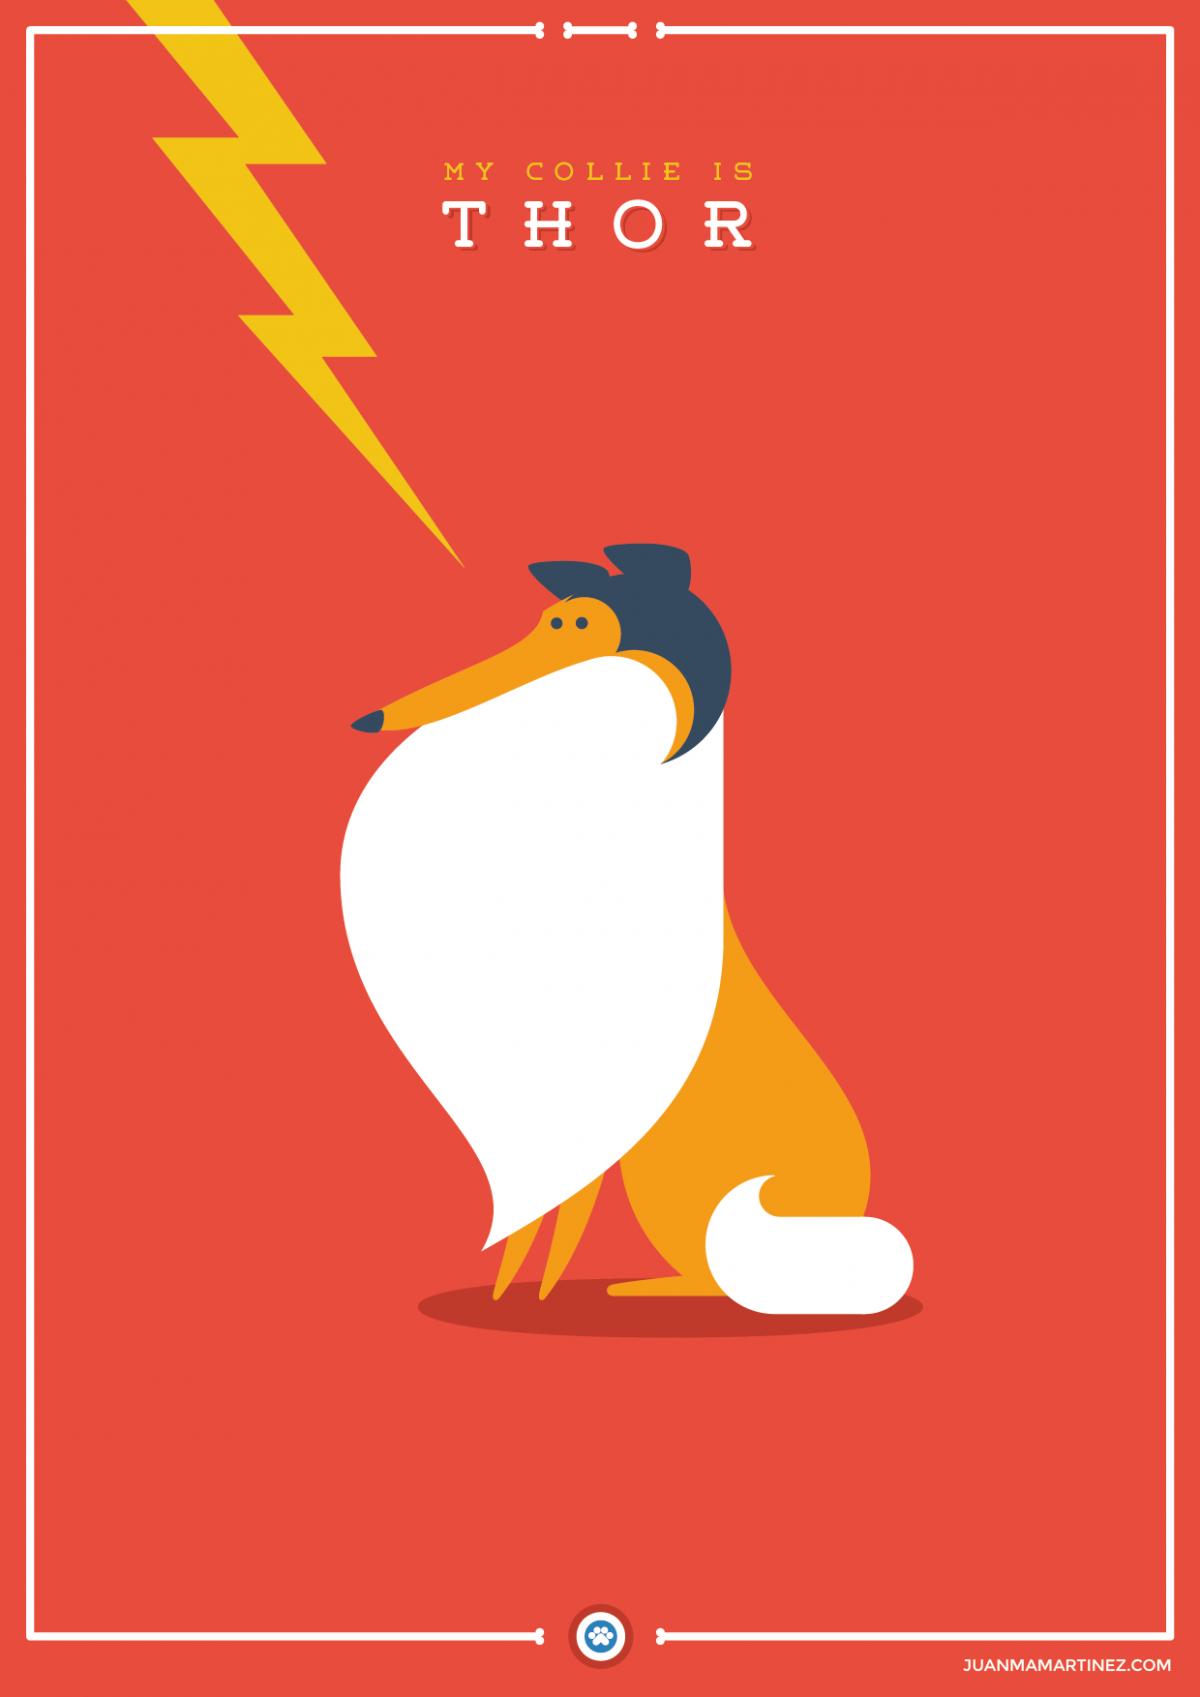 extraordinary-doggies-illustration-4